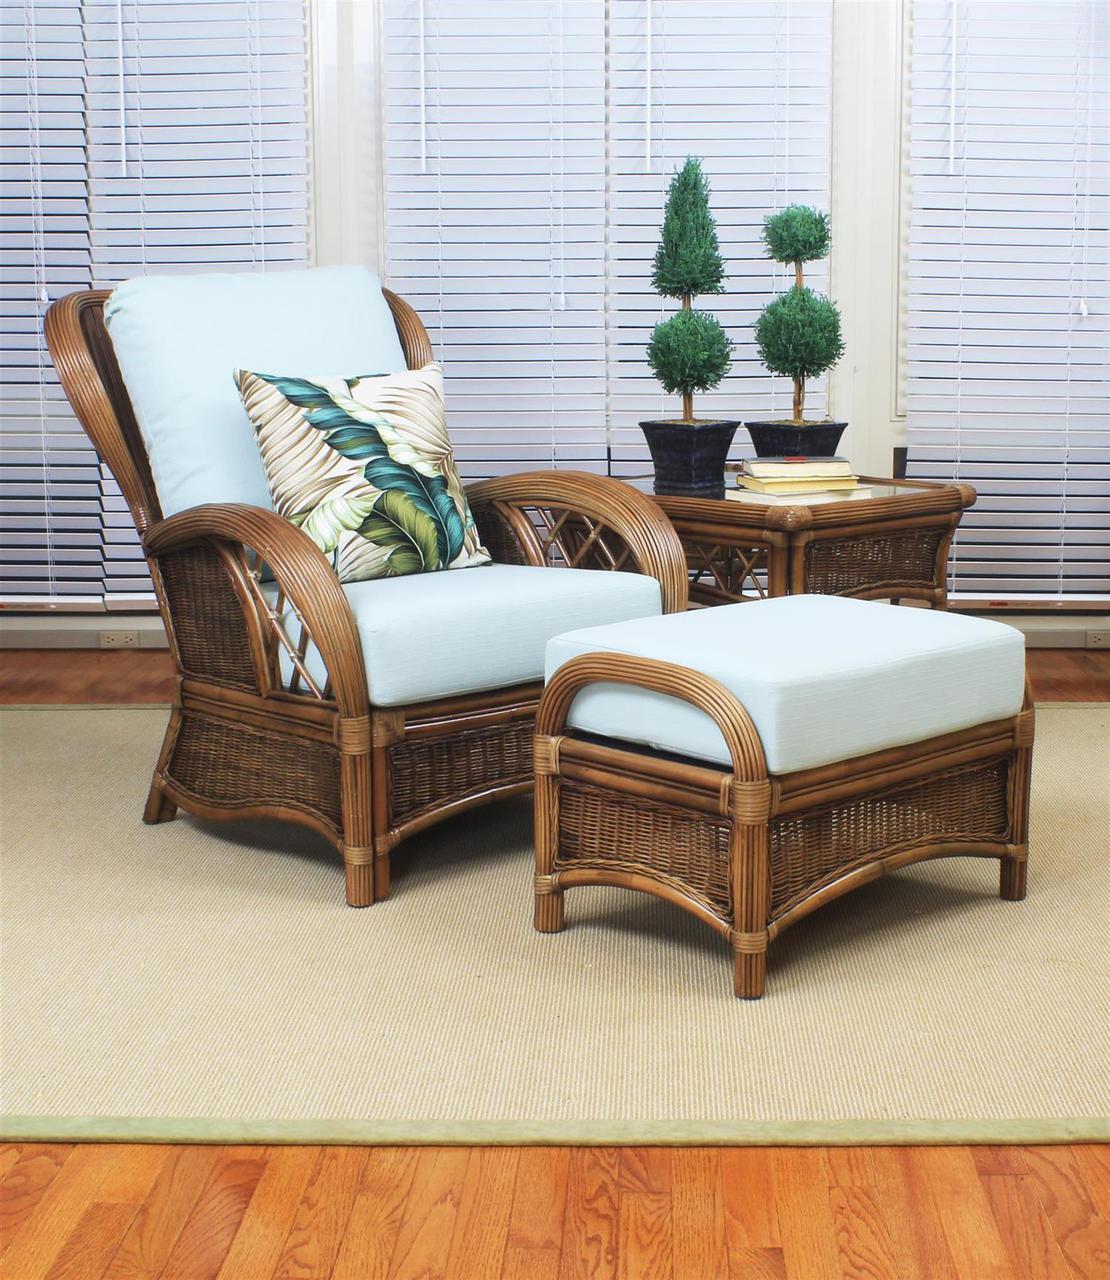 South sea rattan bali indoor wicker lounge chair set modern wicker llc